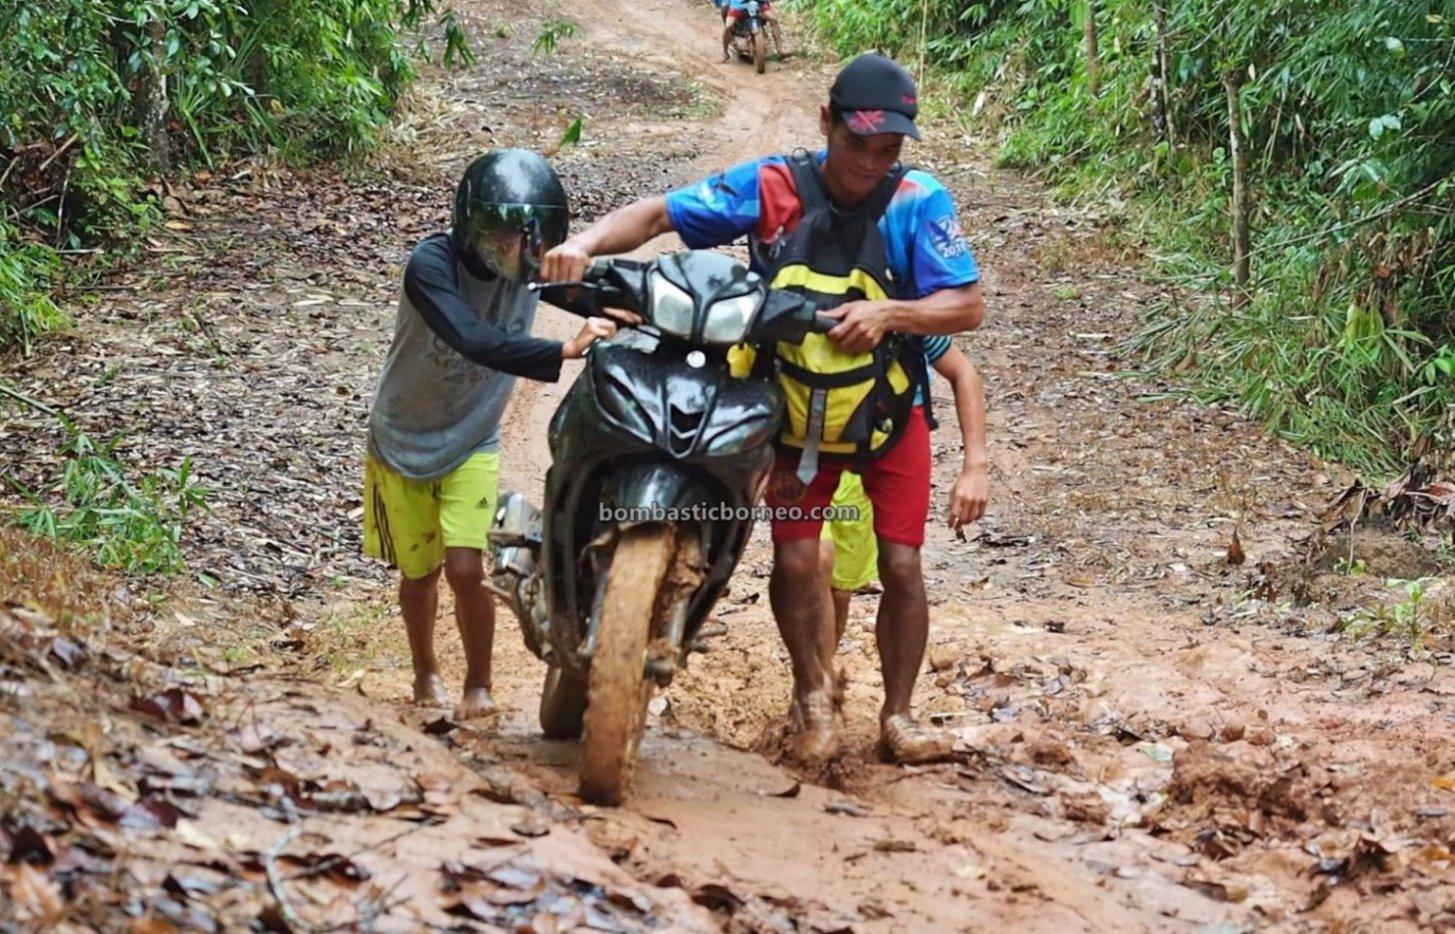 adventure, bike ride, backpackers, event, Bengkayang, Desa Bengkawan, Seluas, Dayak Kowon't, native, Tourism, village, Travel guide, Borneo, 探索婆罗洲游踪, 印尼西加里曼丹